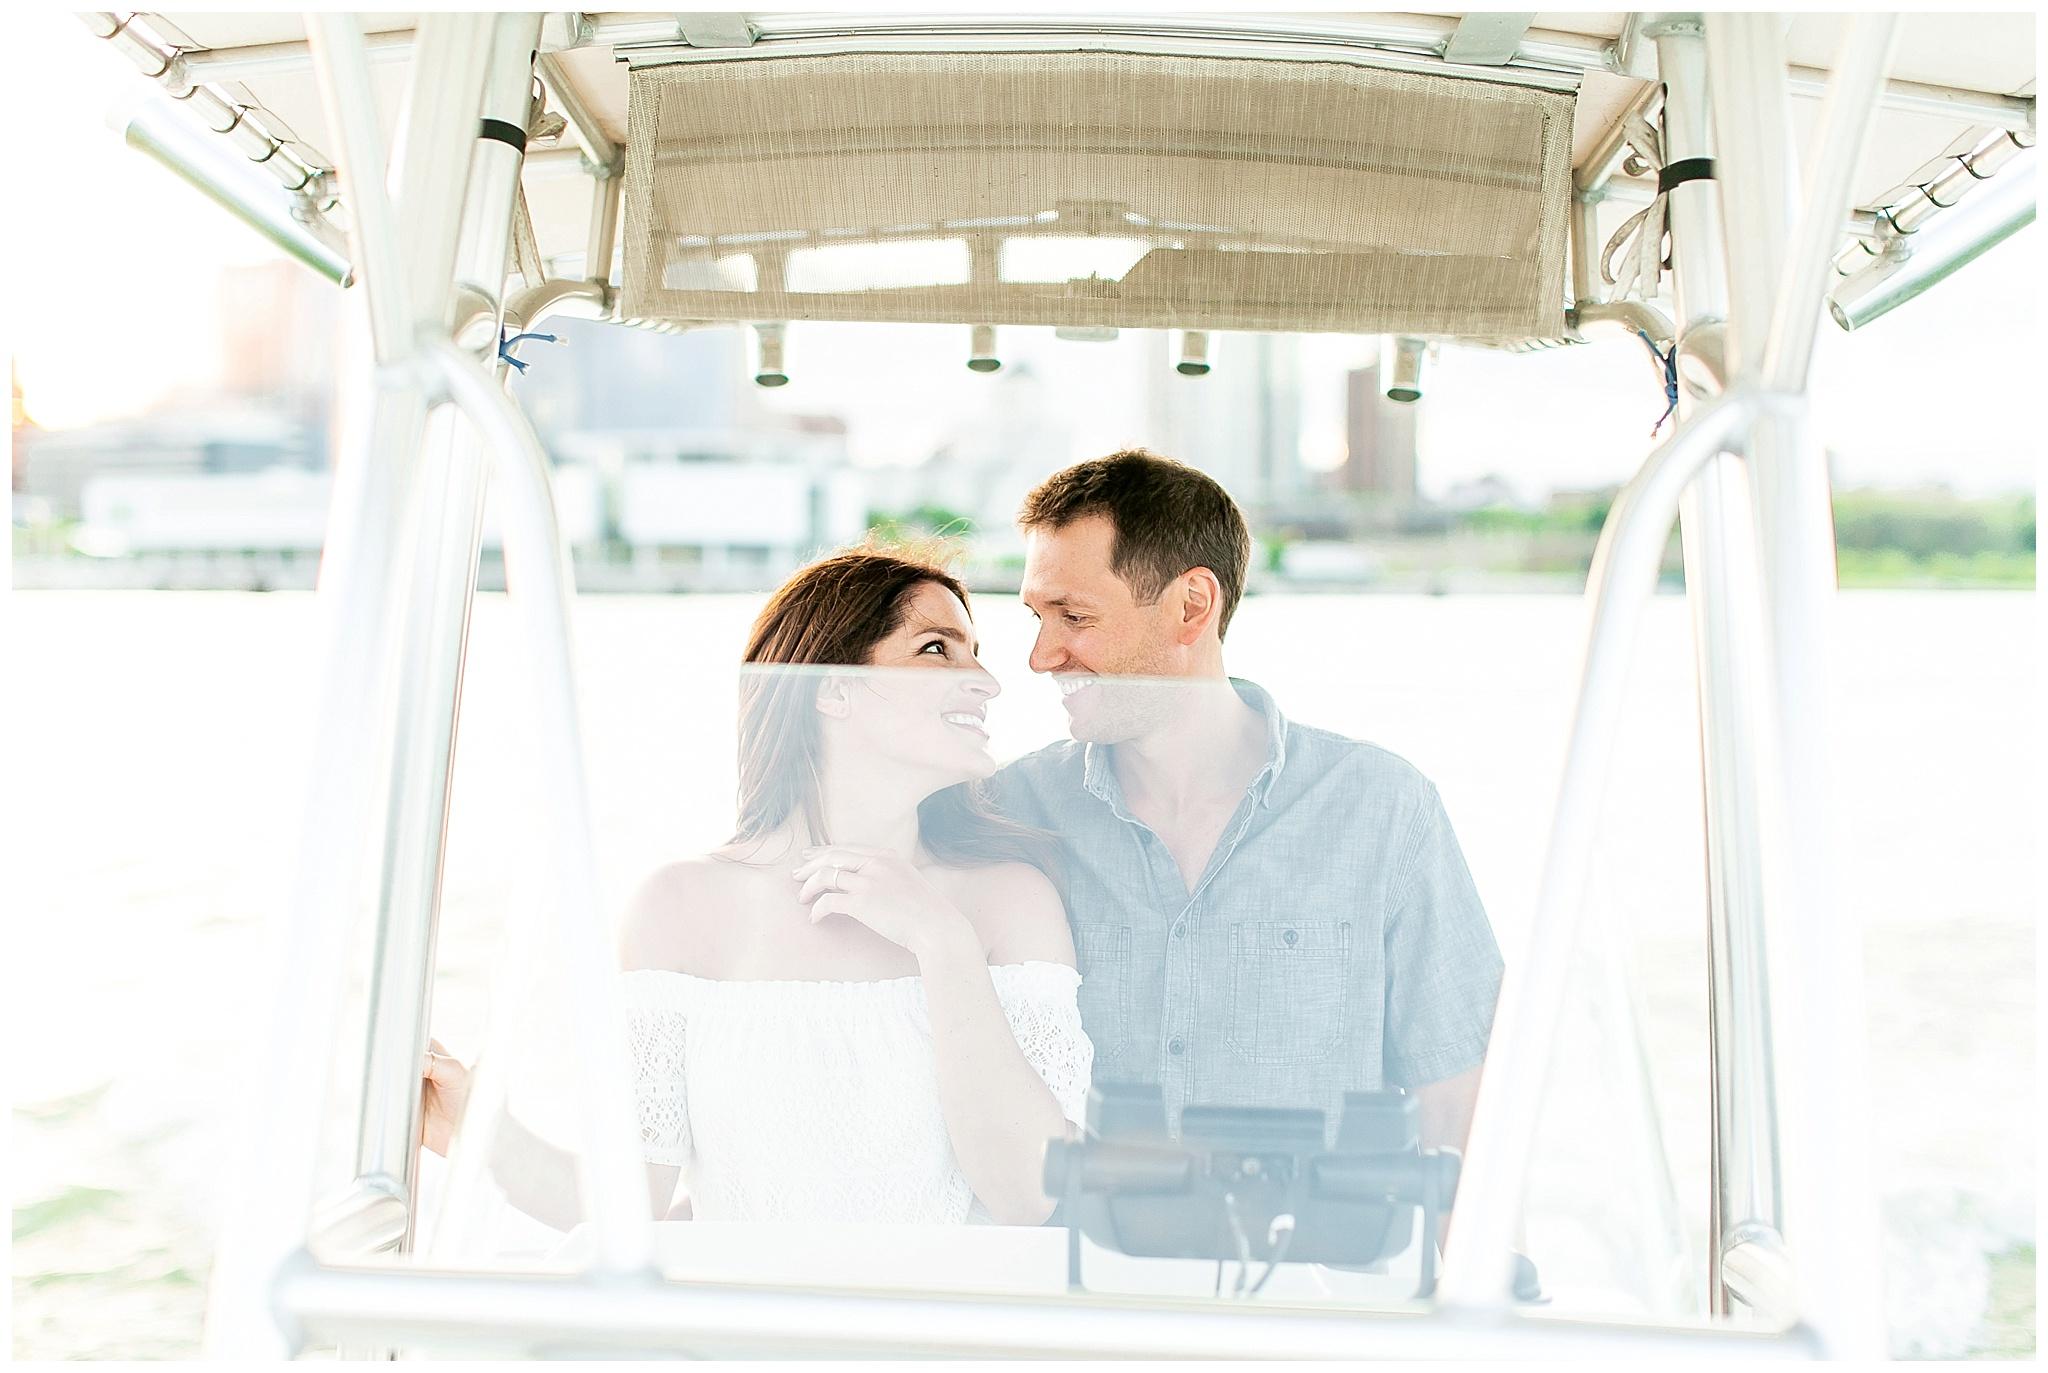 Milwaukee_waterfront_engagement_session_Madison_wisconsin_wedding_photographers_0040.jpg